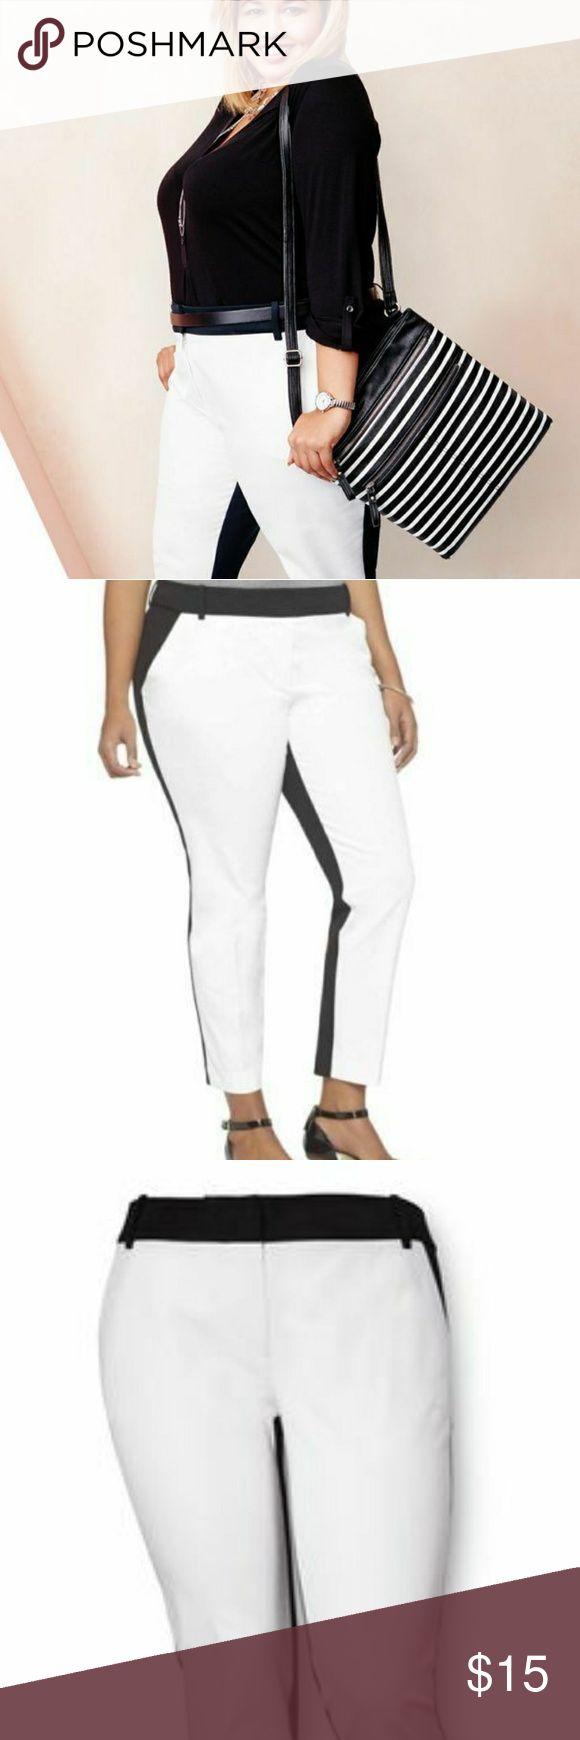 Nwt Ava & Viv colorblock slacks business casual Nwt Ava & viv colorblock black and white slacks. Multiple sizes available. Skinny fit at bottom shape enhancing panel. Mid rise, ankle length. Ava & Viv Pants Skinny